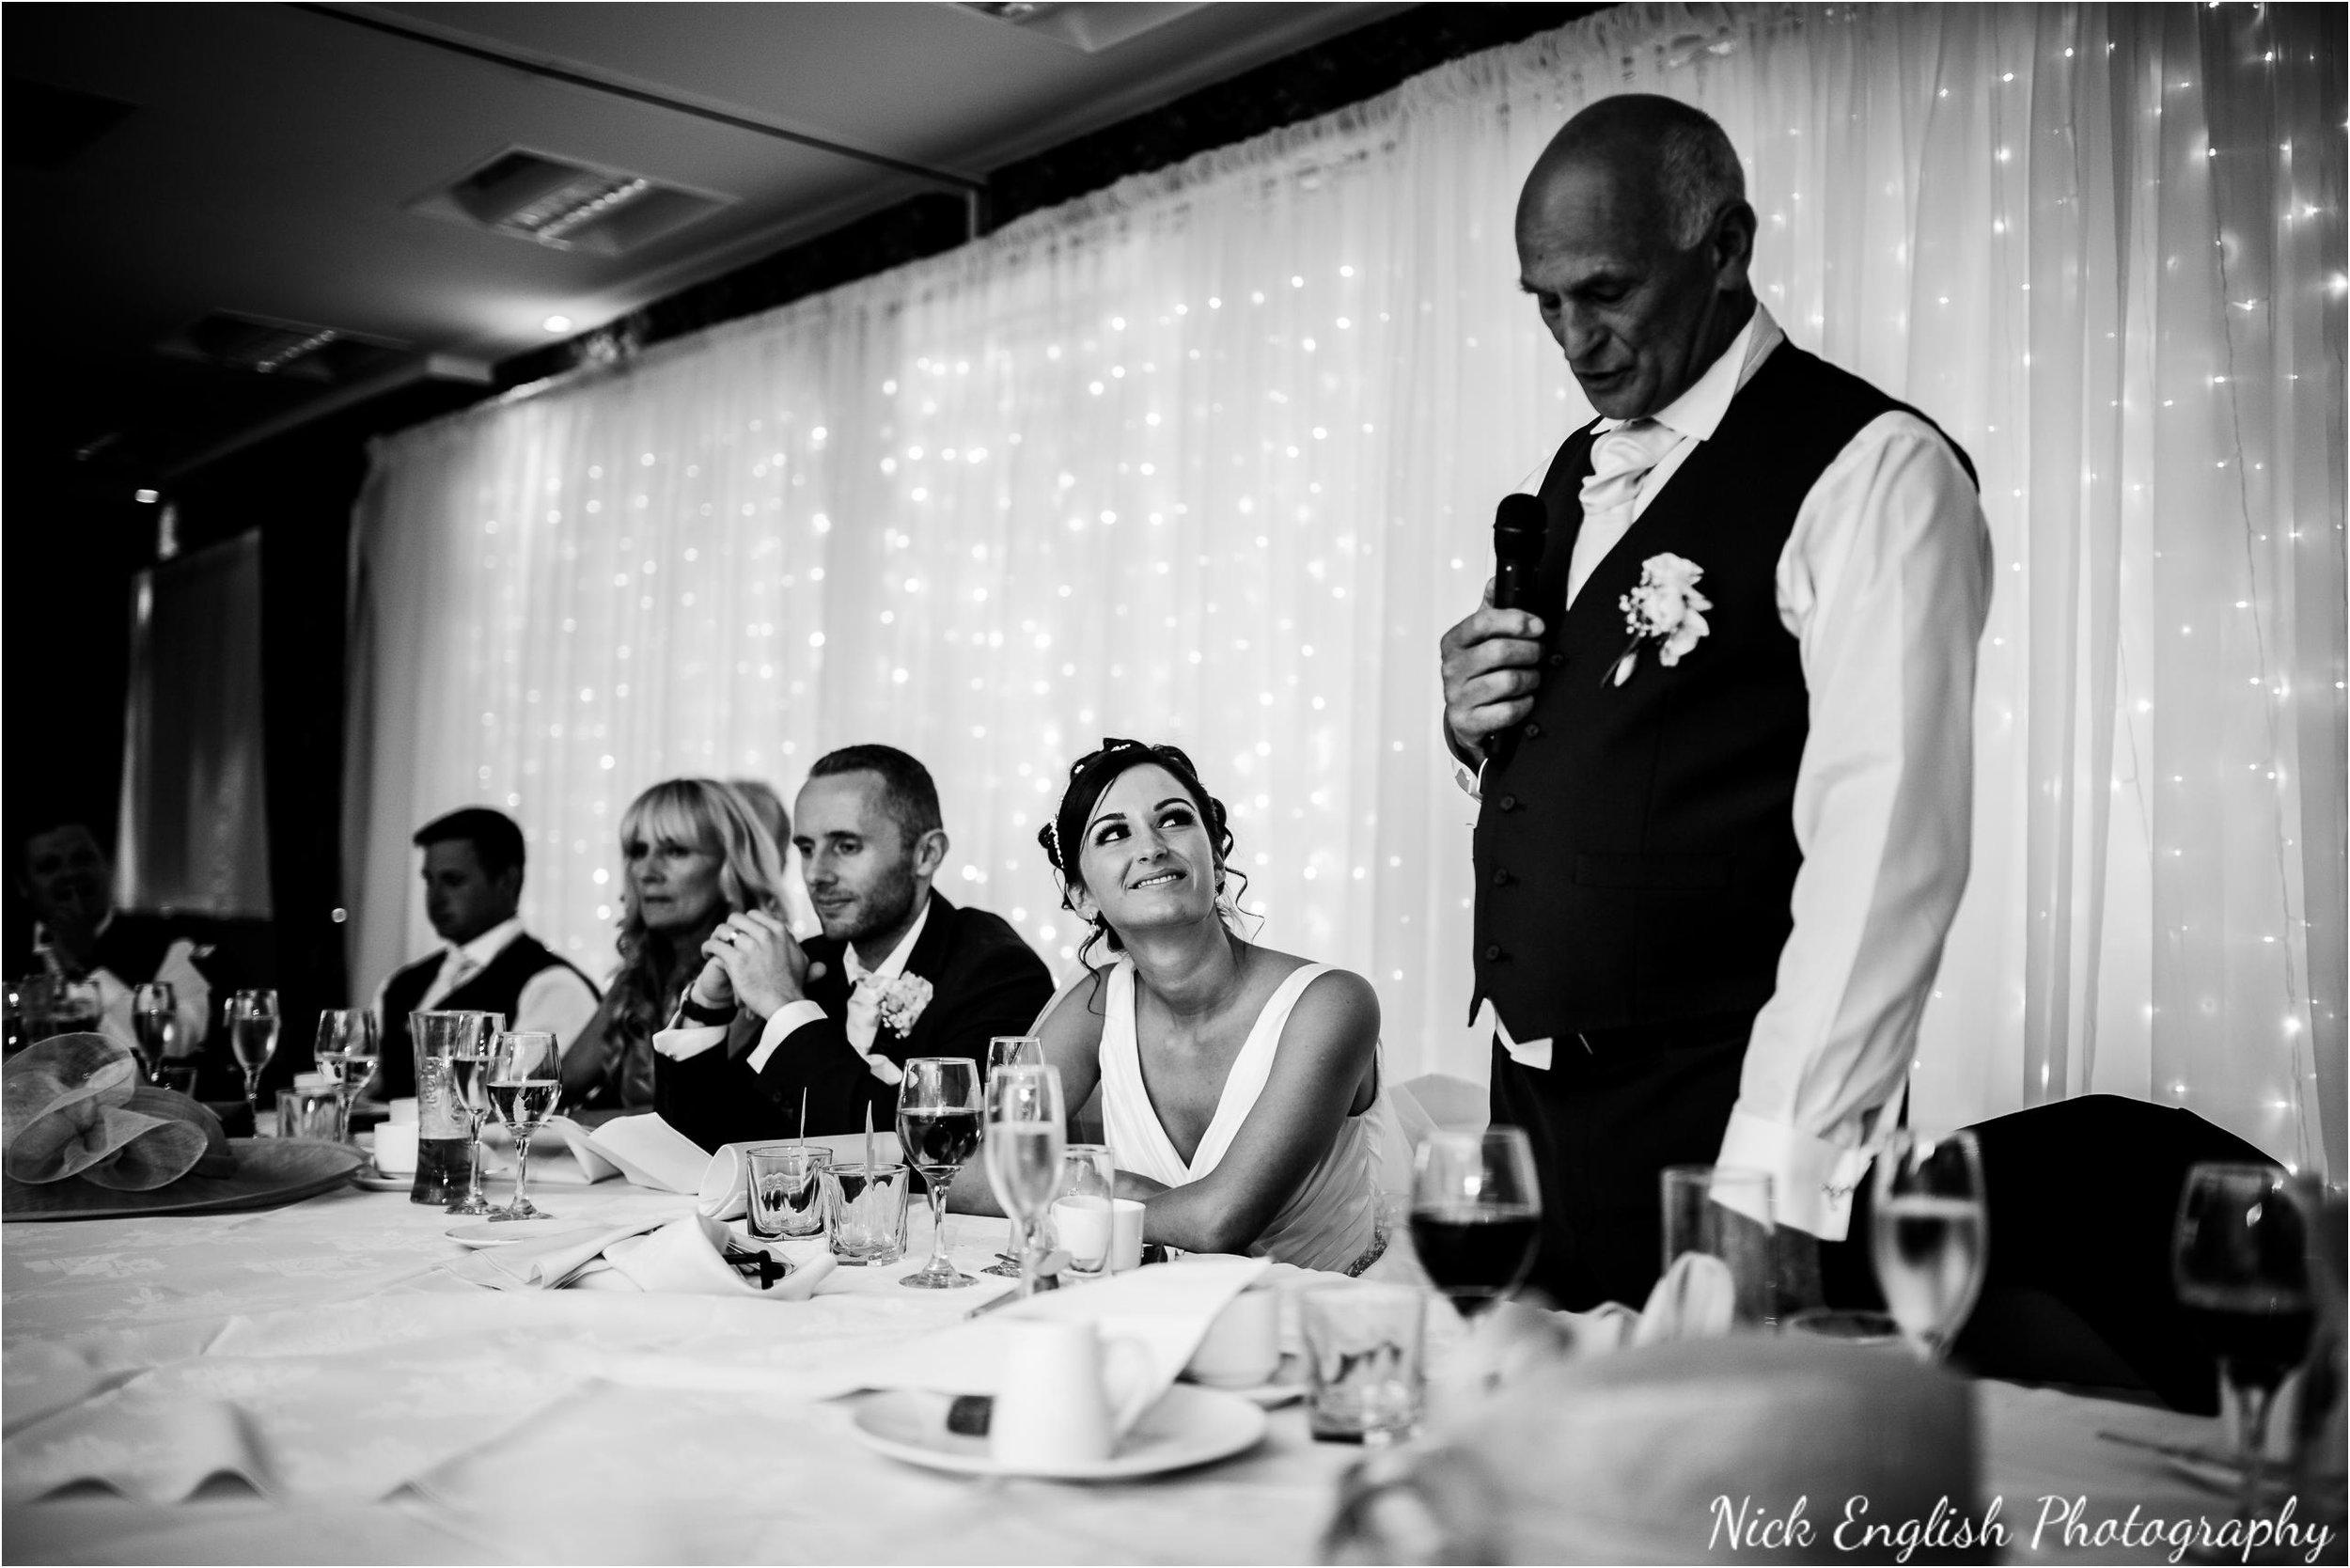 Emily David Wedding Photographs at Barton Grange Preston by Nick English Photography 169jpg.jpeg